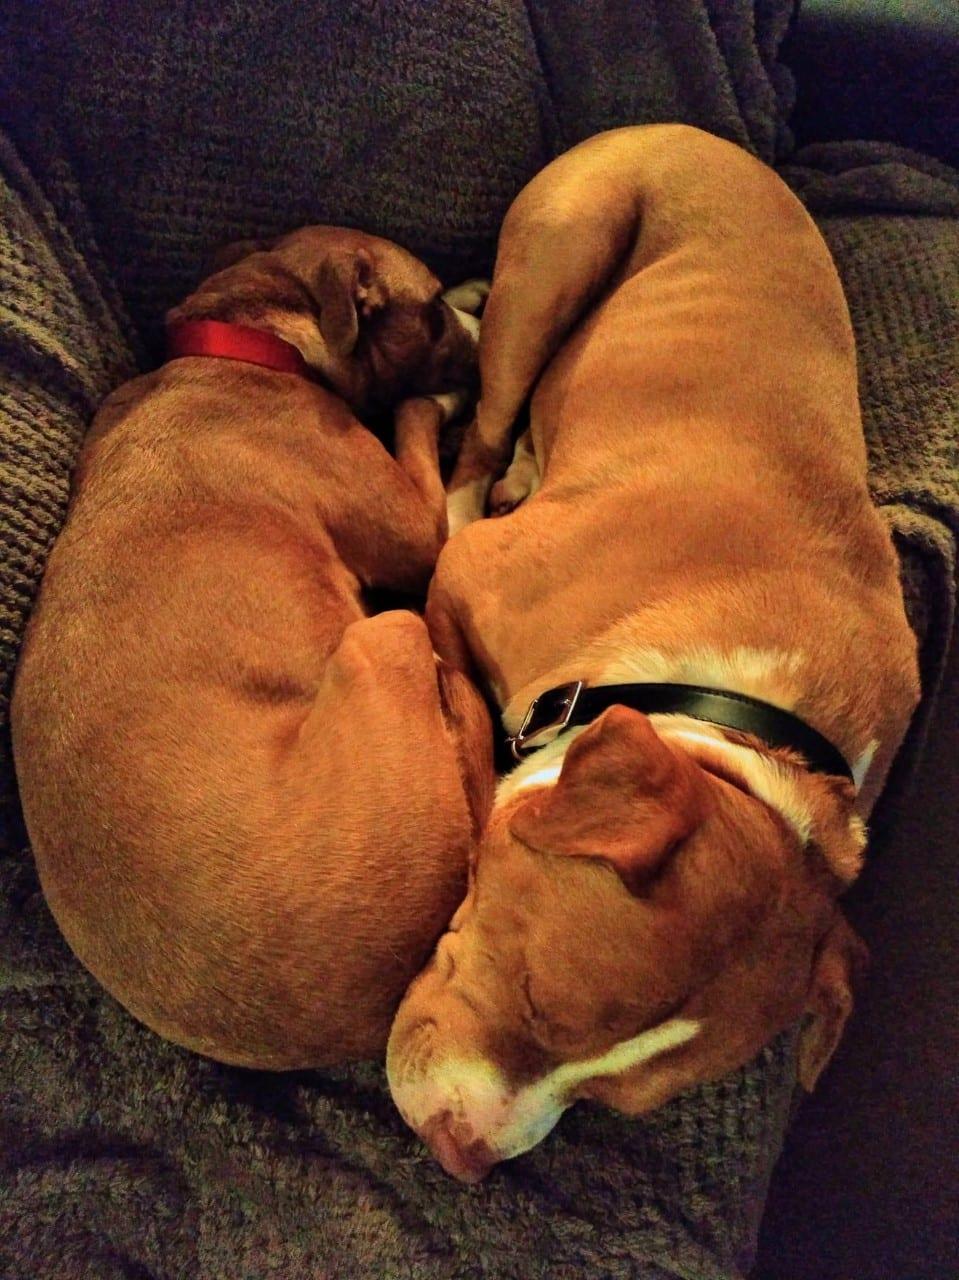 Chase an Amercian Bulldog cross cuddling | 1 Dog At a Time Rescue UK